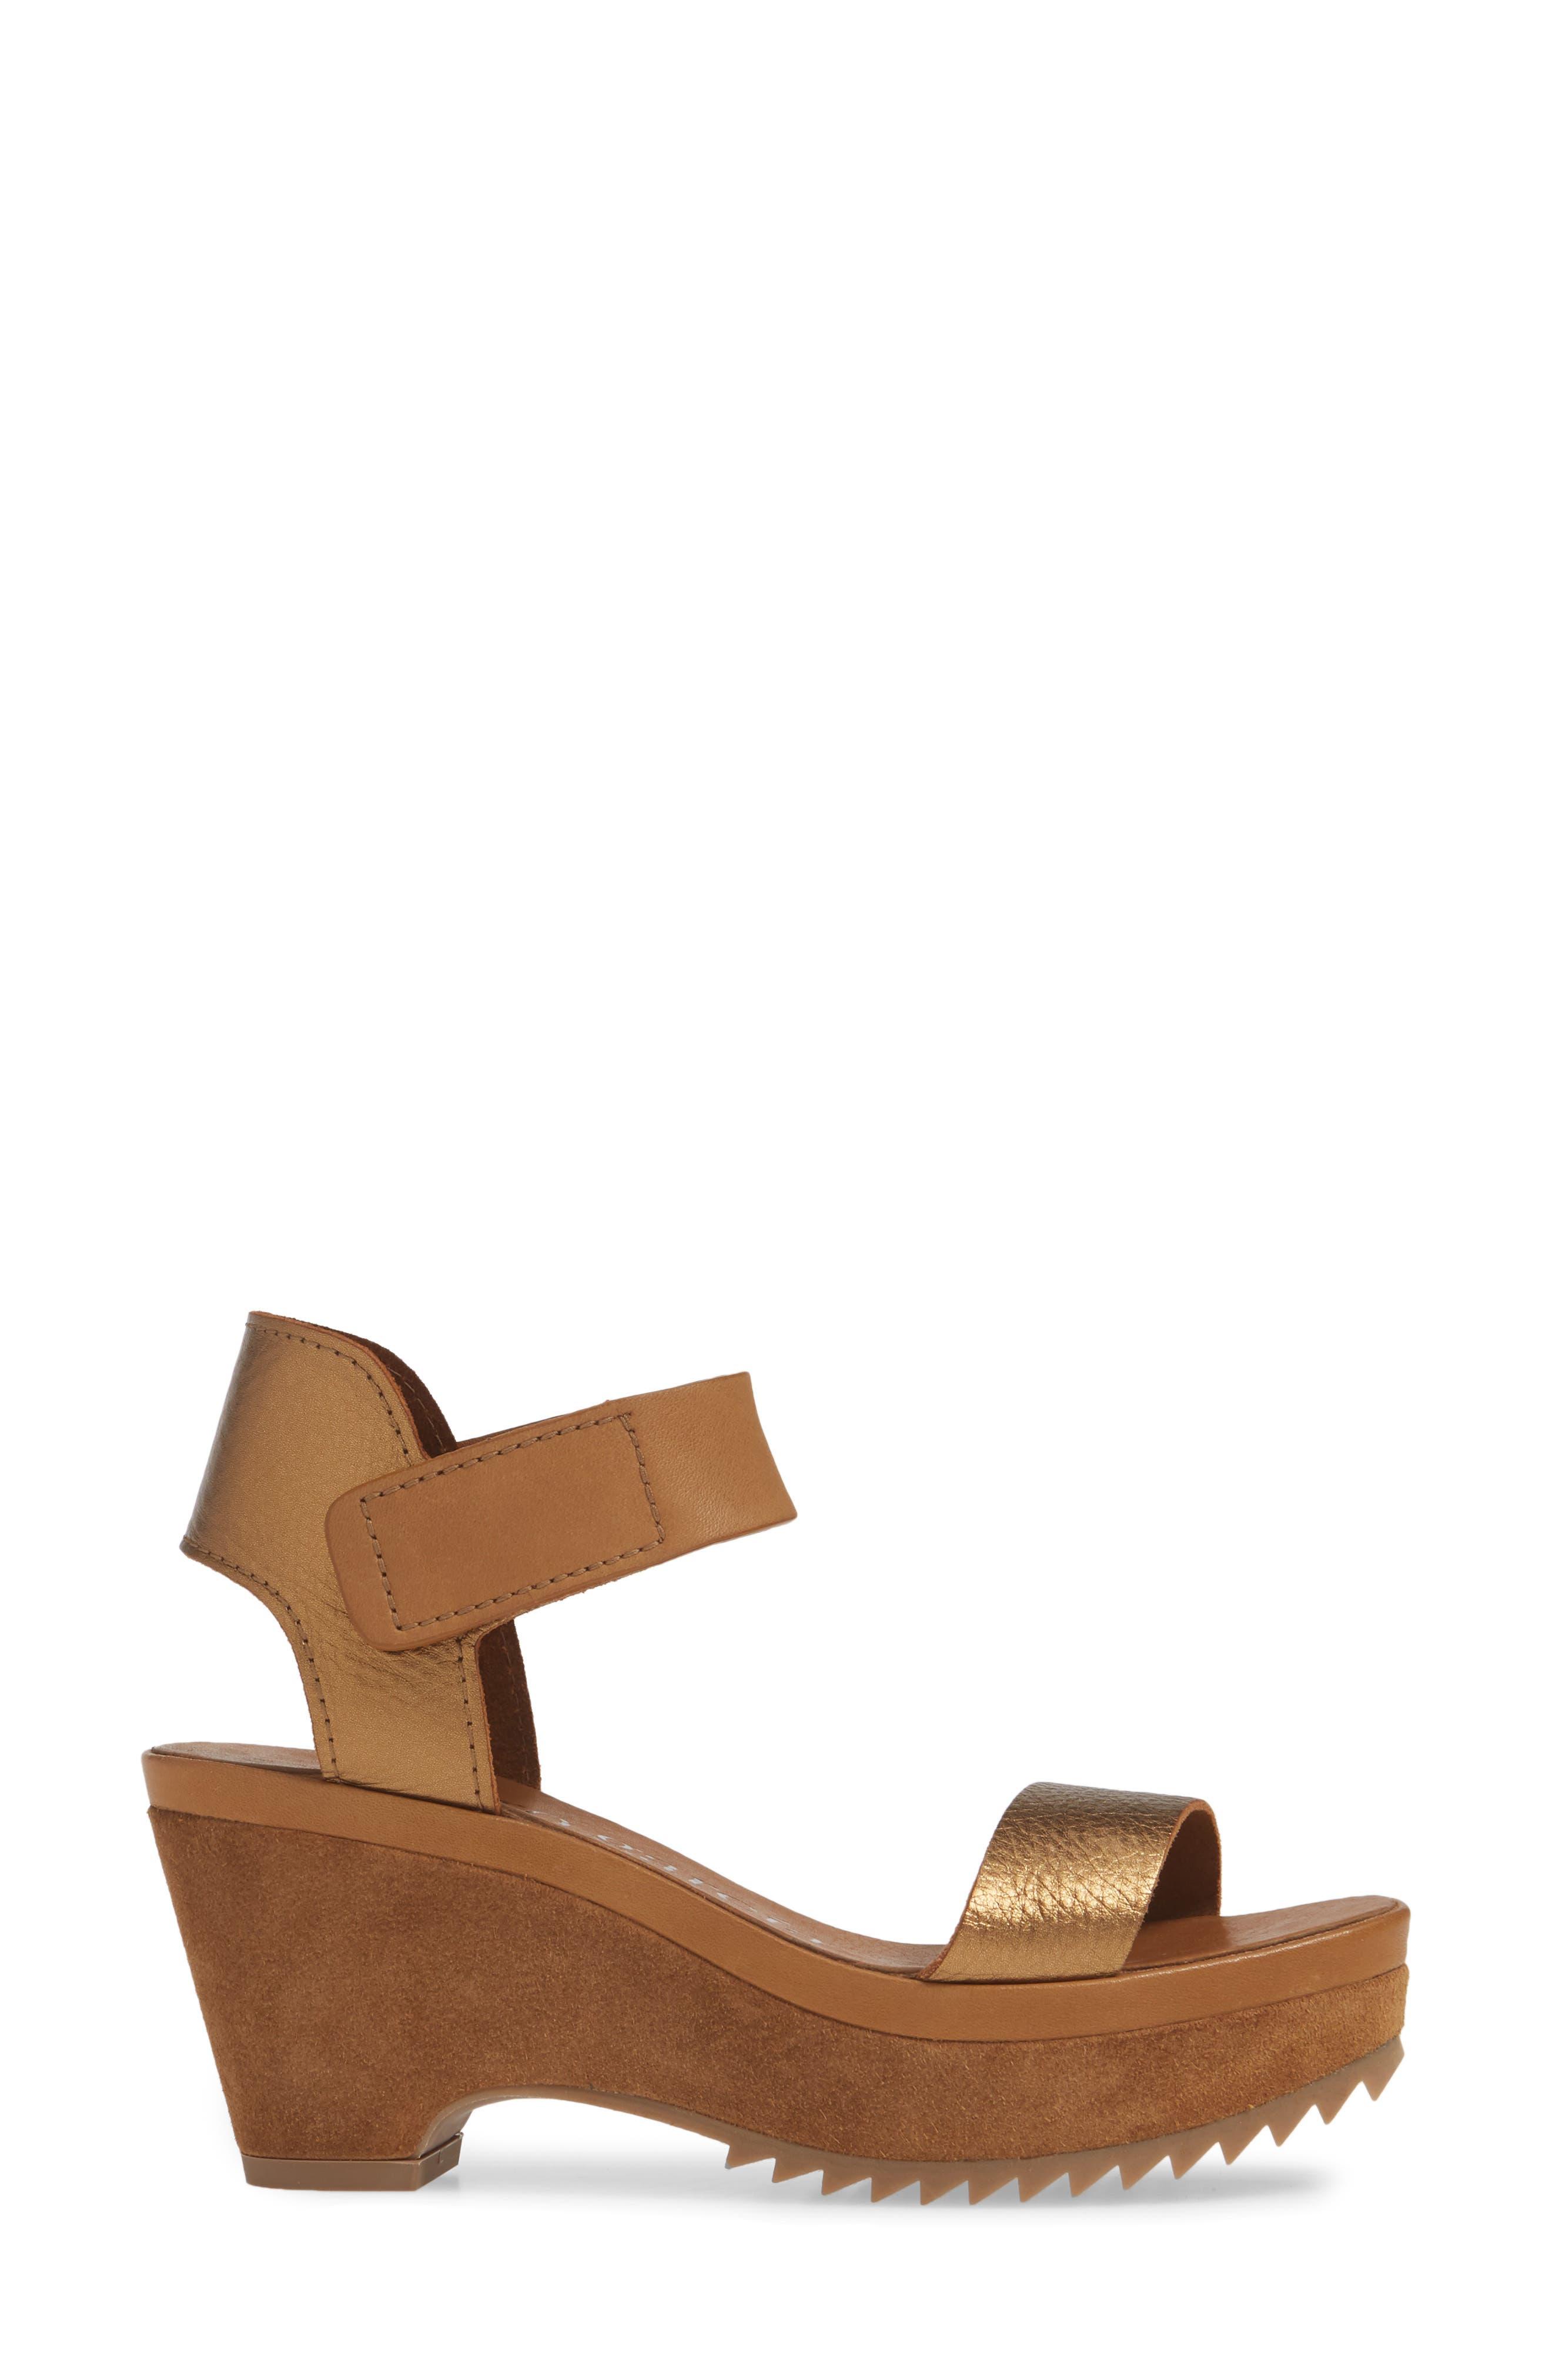 PEDRO GARCIA, Franses Flatform Sandal, Alternate thumbnail 3, color, TOBACCO CERVO LAME